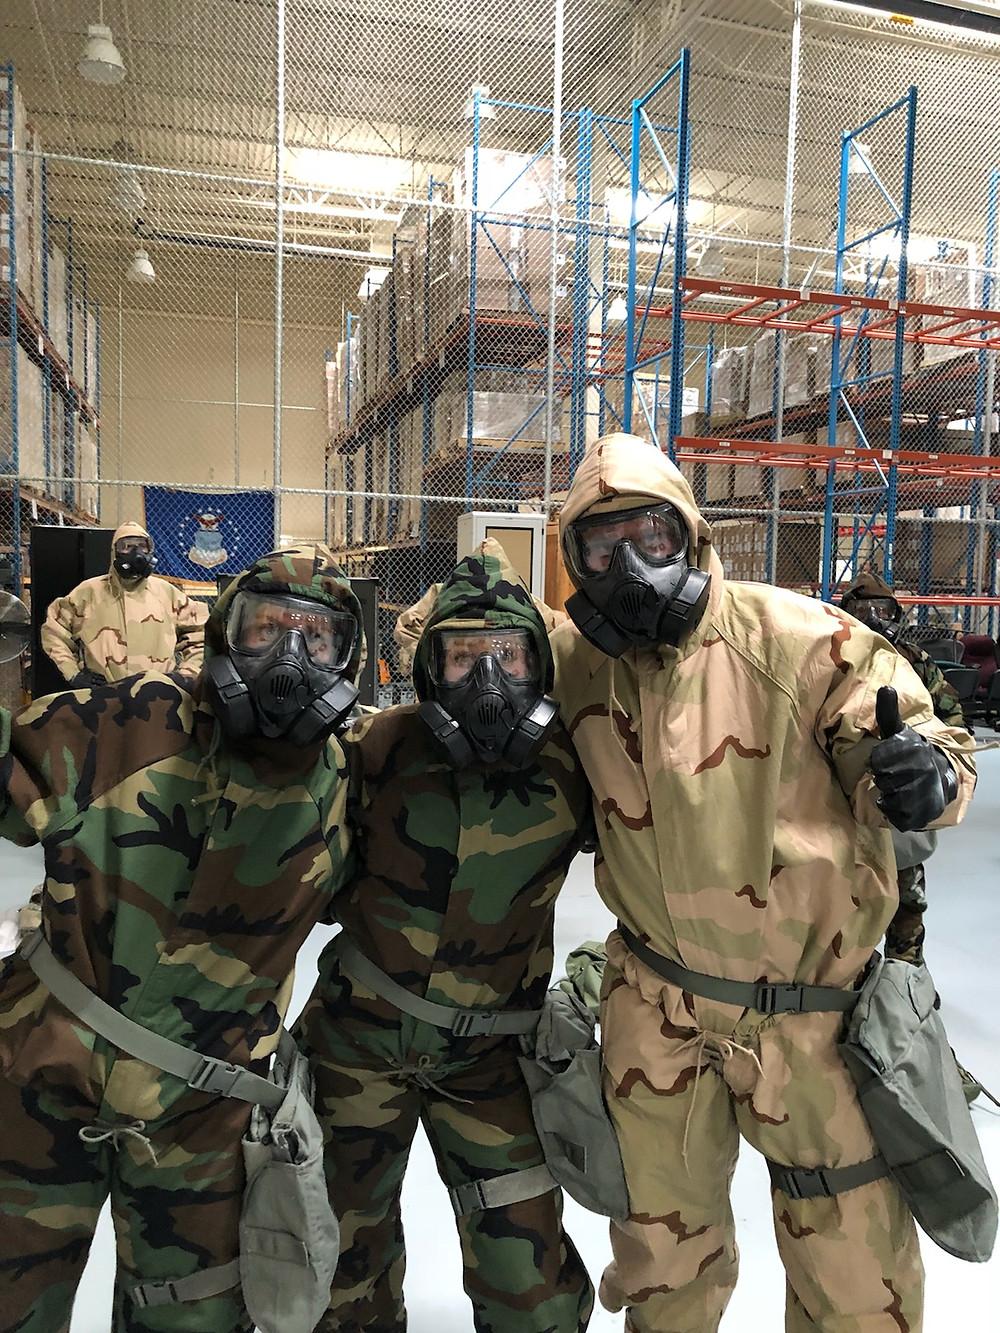 Dental team gas masks